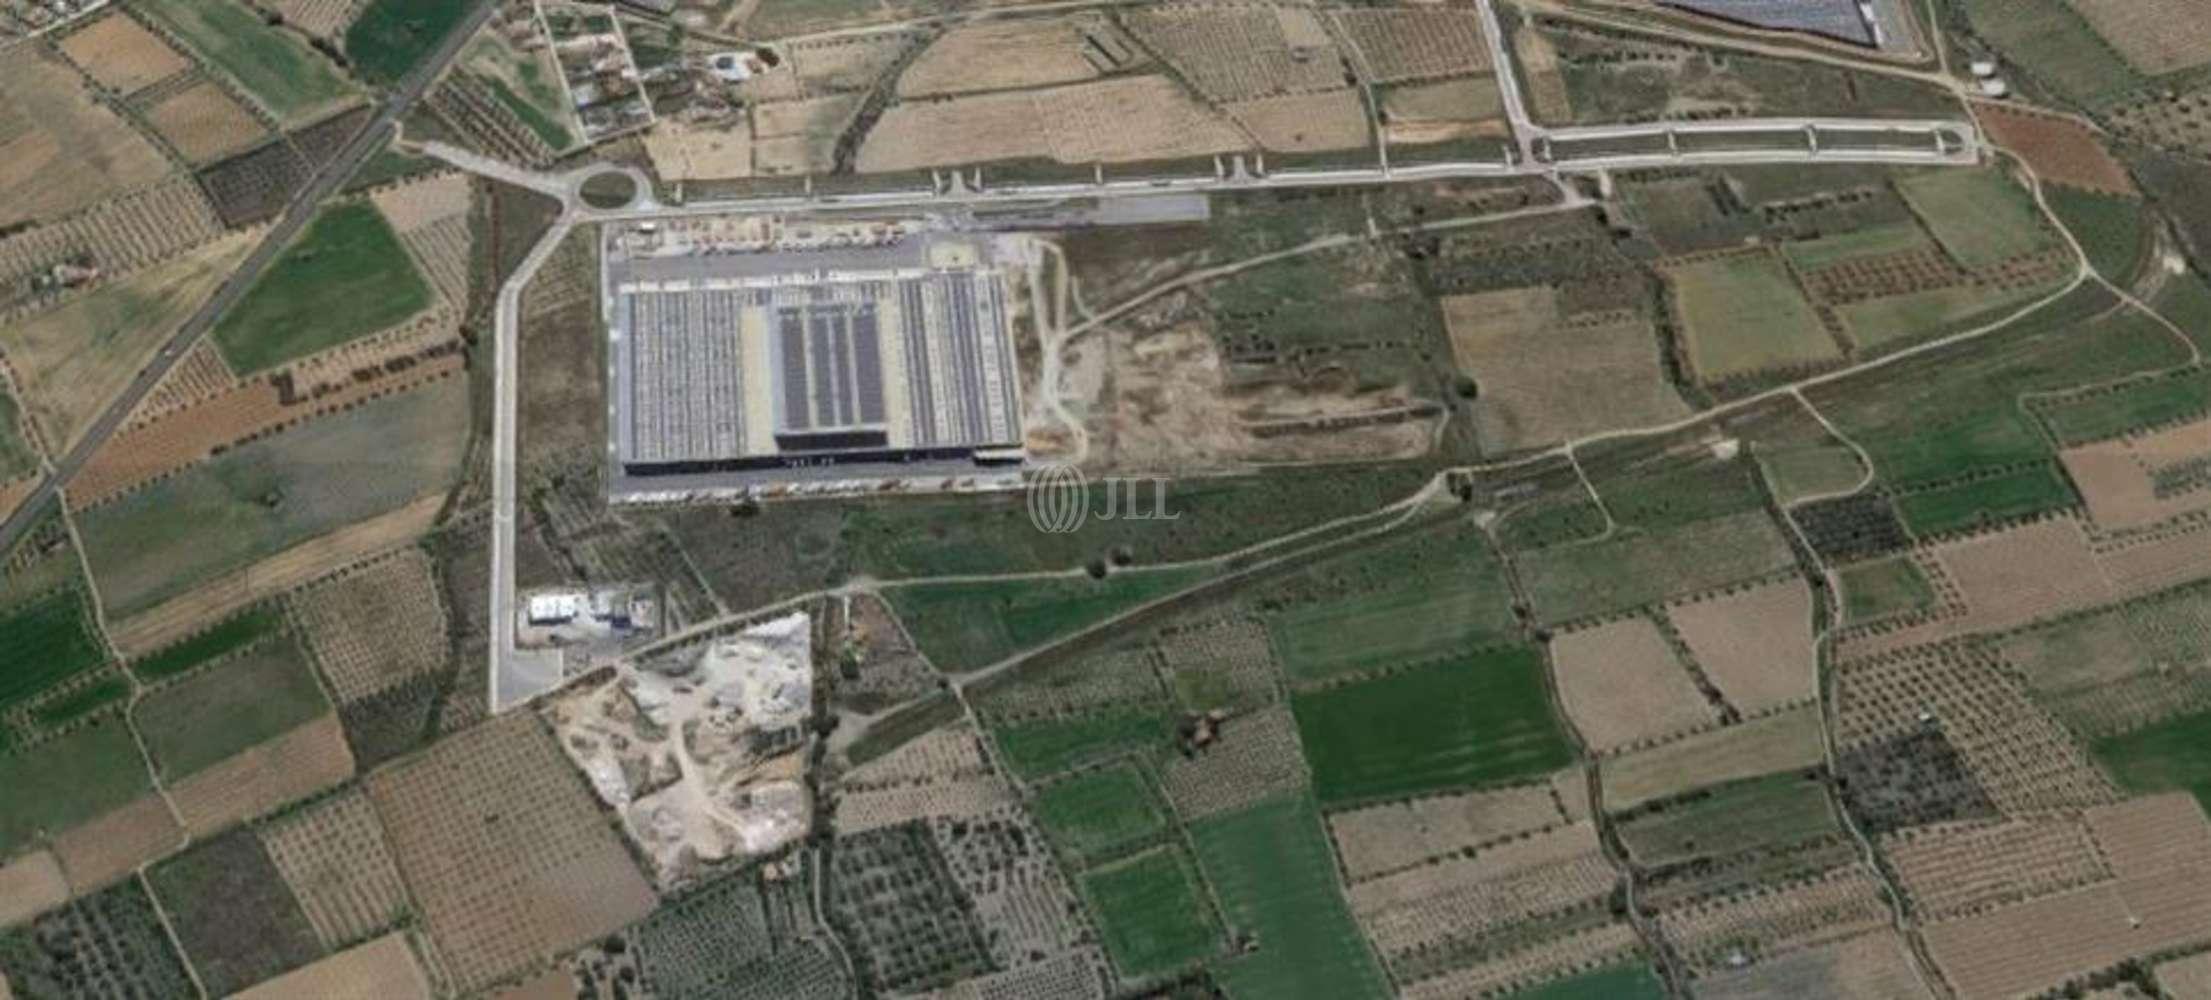 Naves industriales y logísticas Valls, 43800 - Nave Logistica - B0436 - PI VALLS - 10506